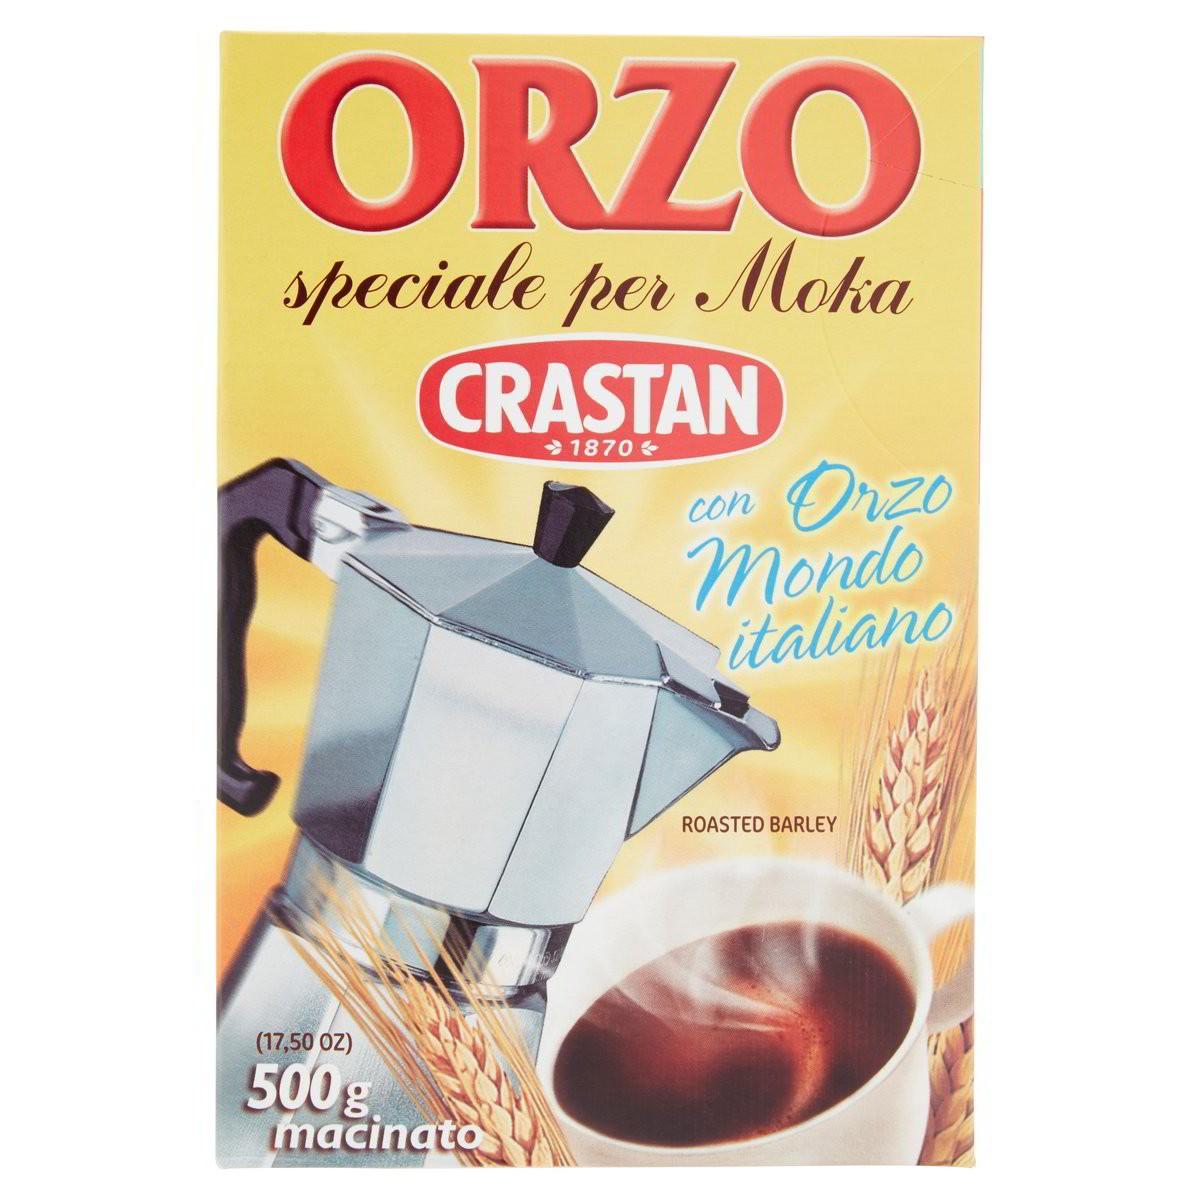 Crastan Orzo macinato speciale per Moka